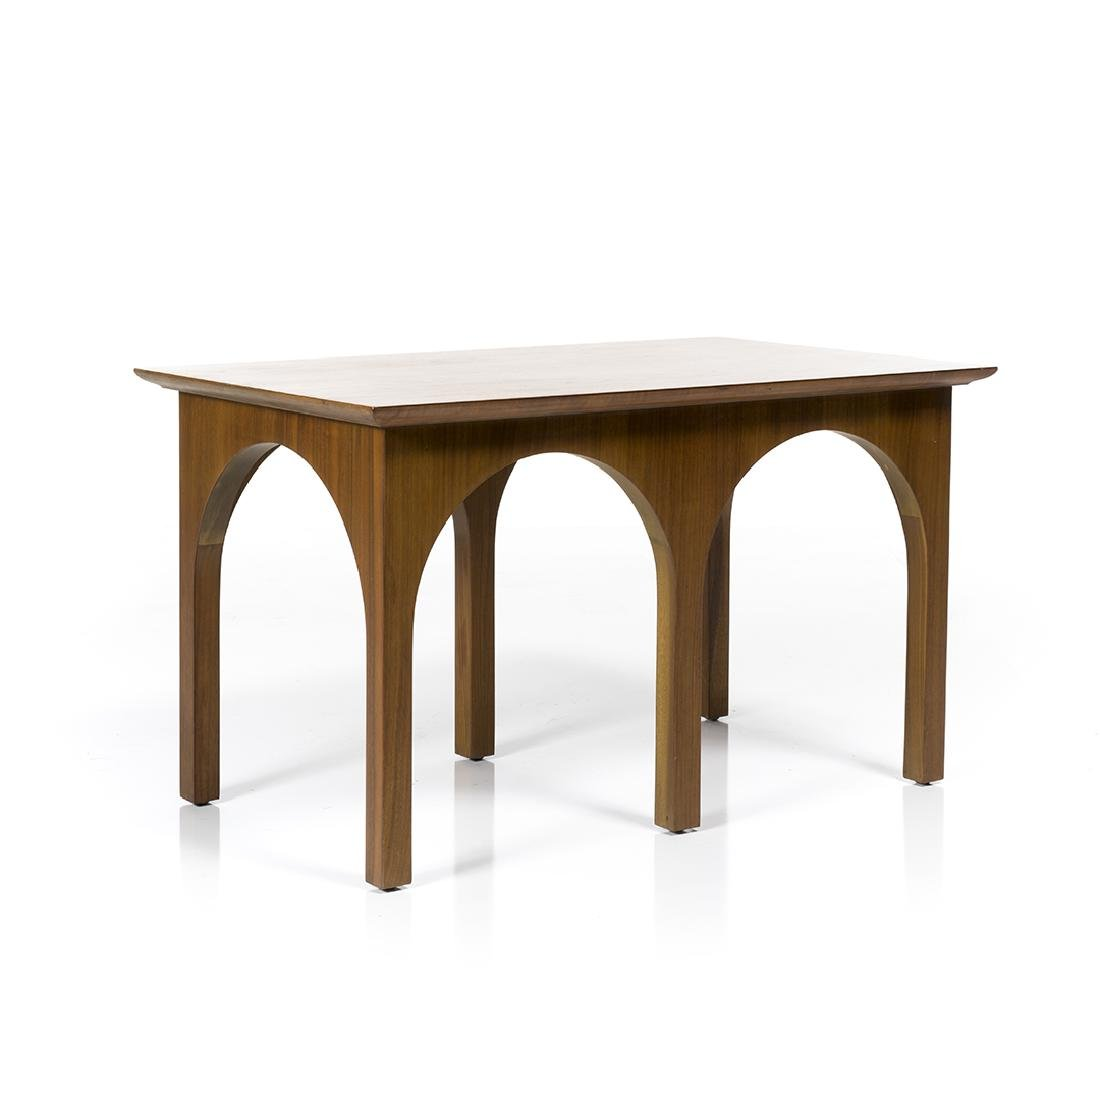 T.H. Robsjohn-Gibbings Coffee Table